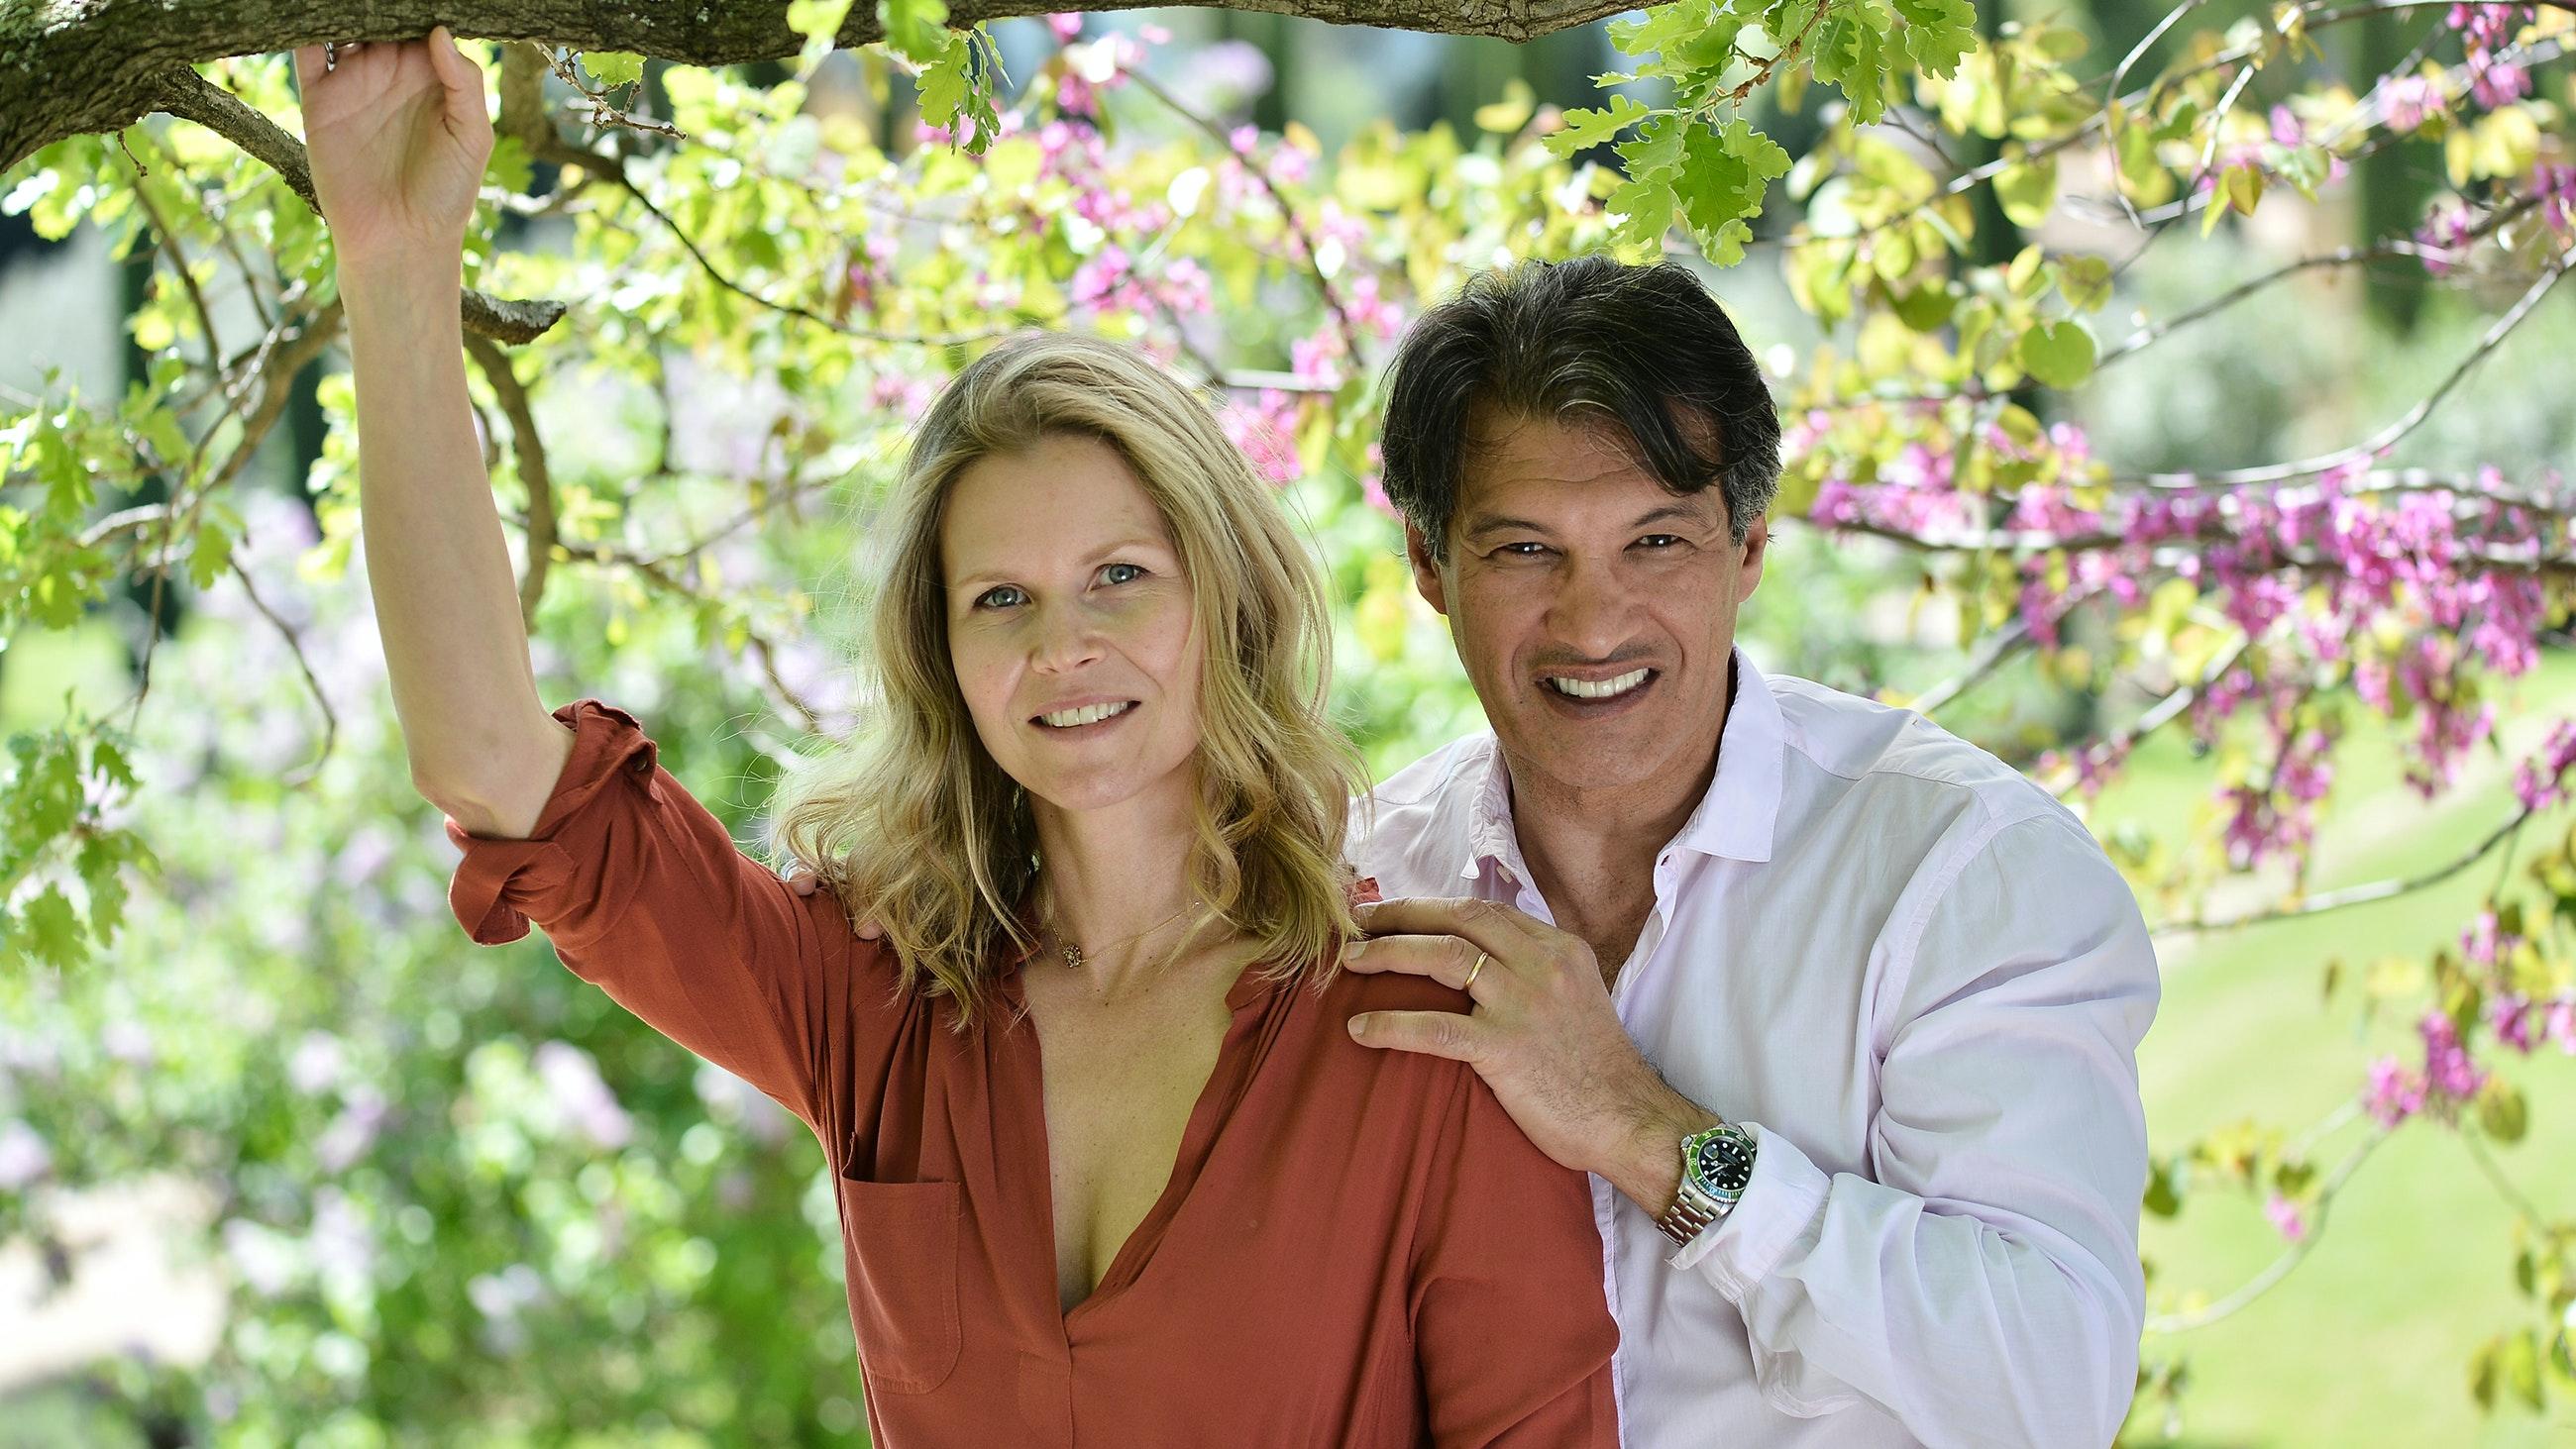 Founders of Bastide Frederic Fekkai and Shirin von Wulffen Share Their Beauty Secrets